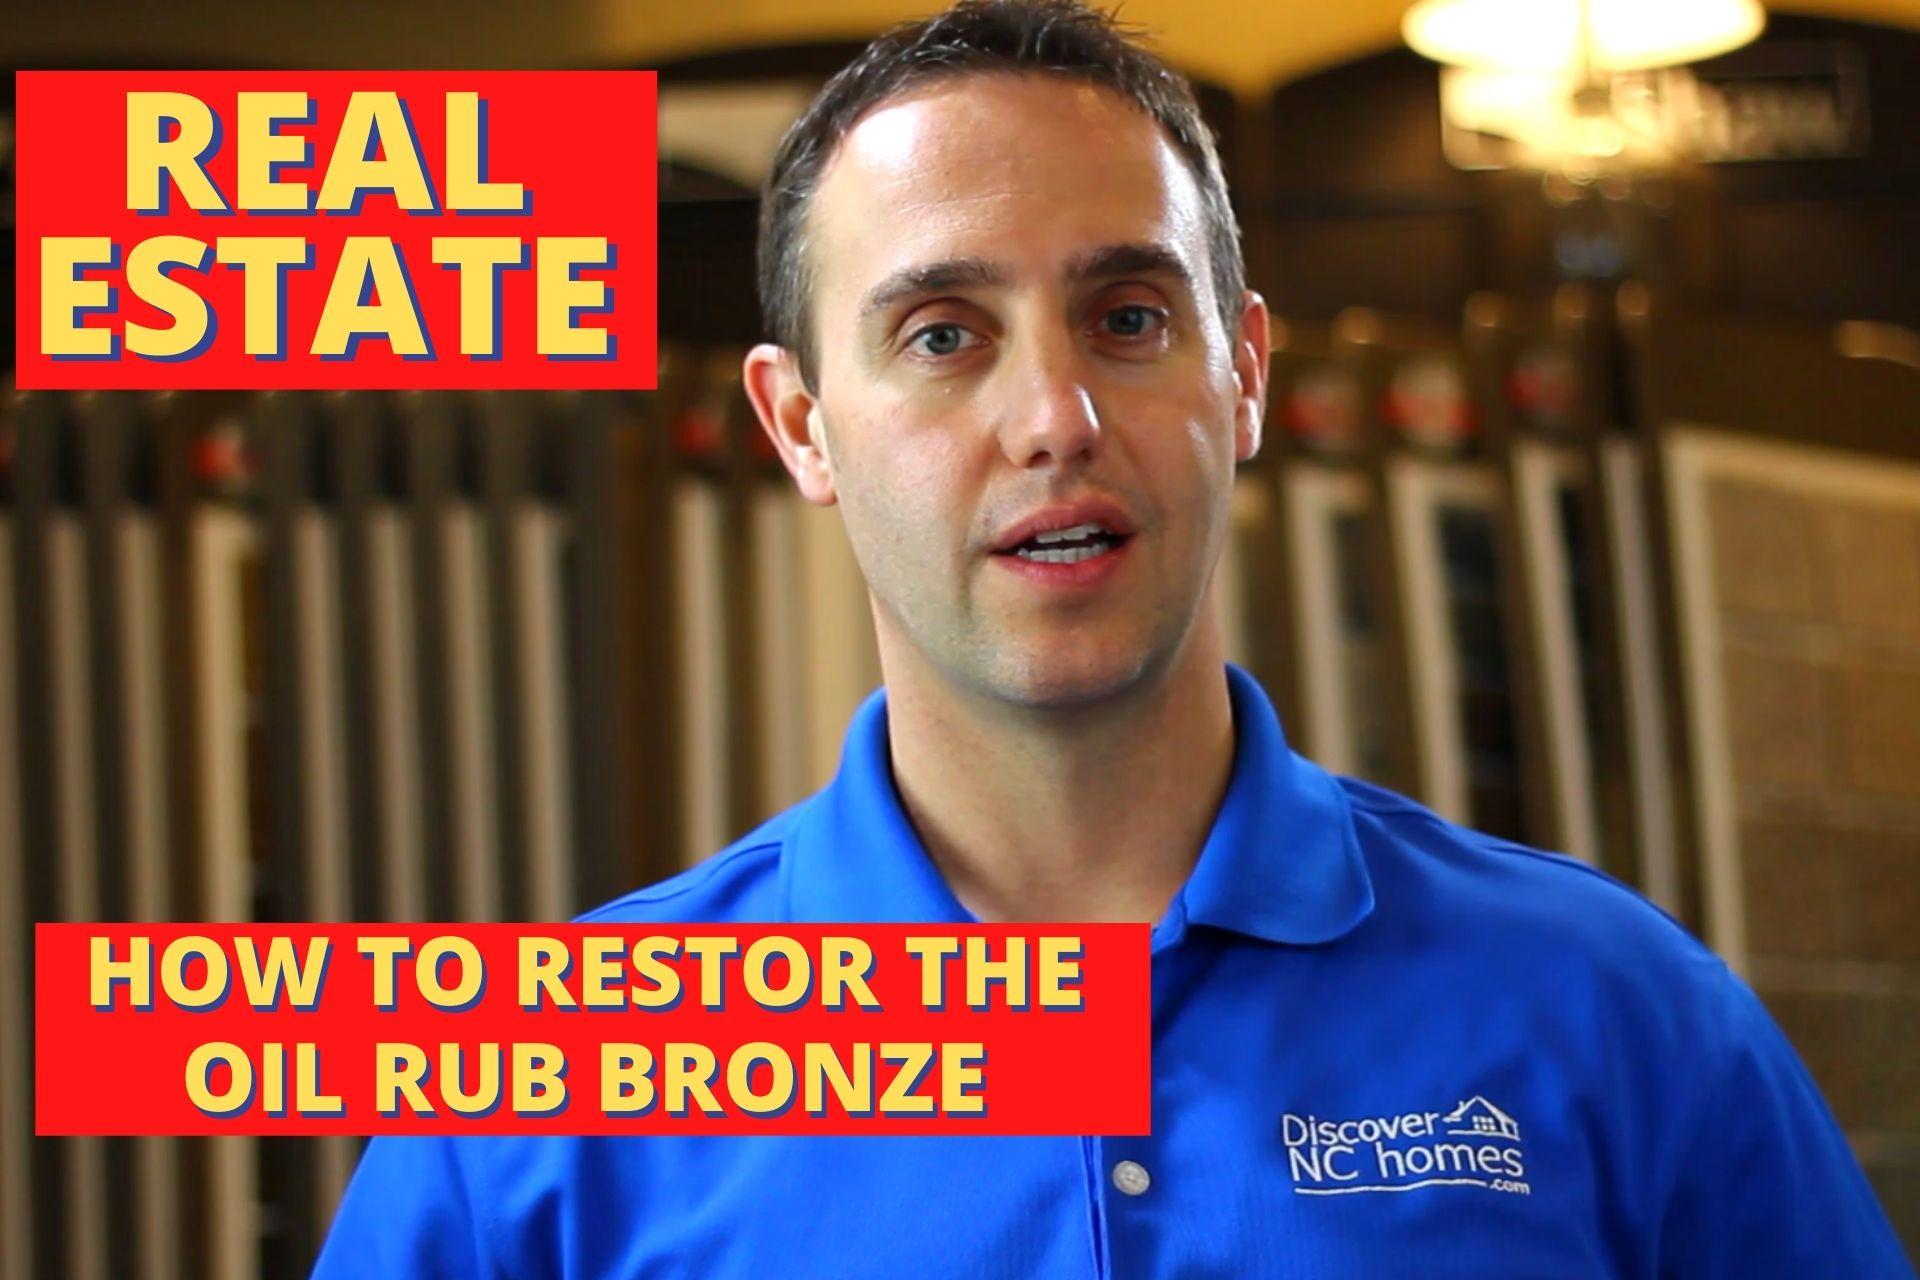 Restore oil rub bronze - Nolan Formalarie